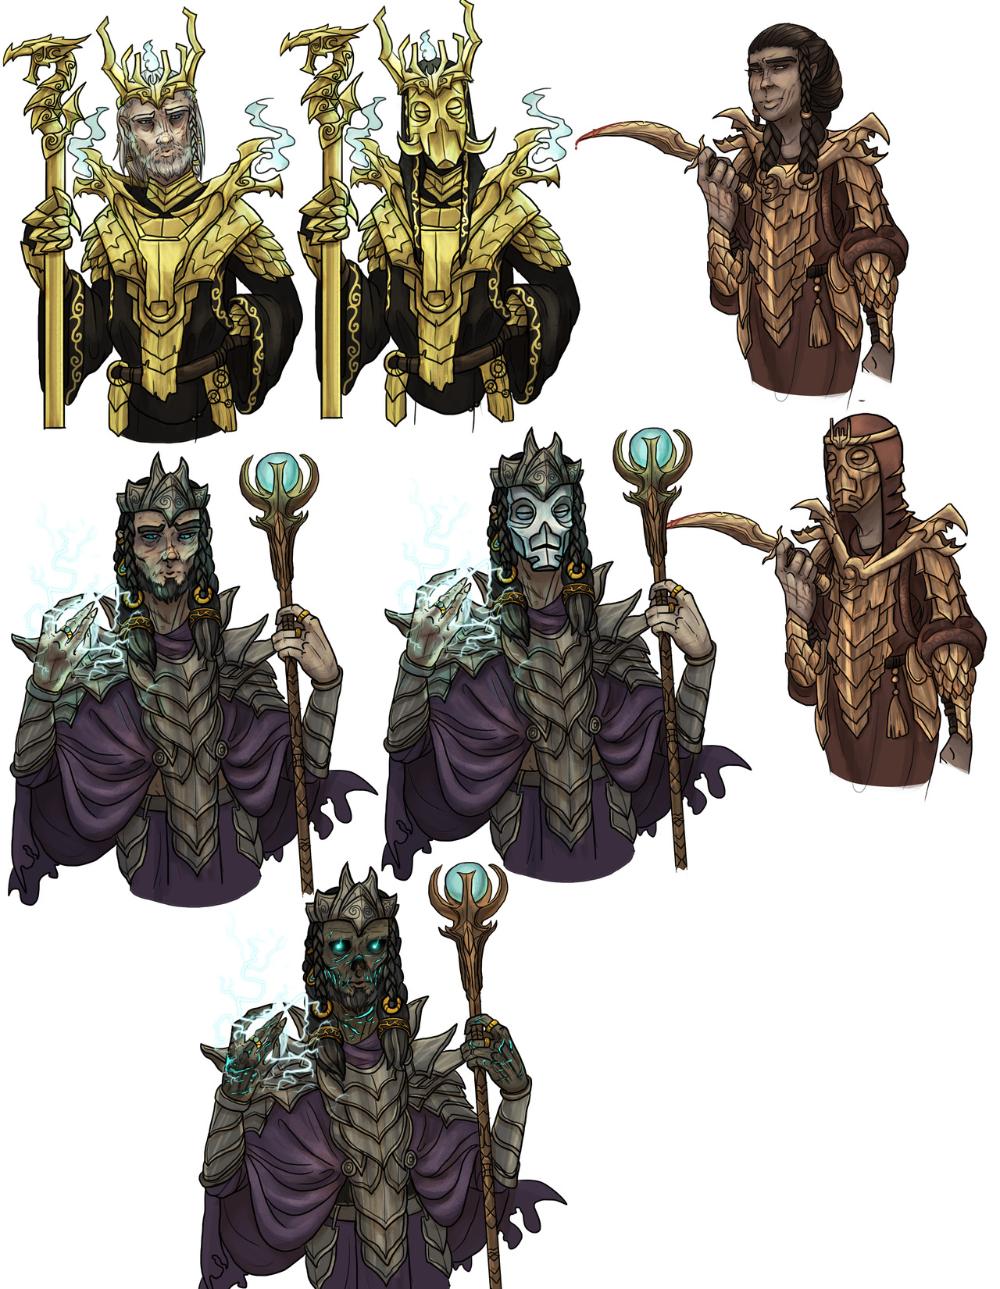 Konahrik Volsung And Morokei By Qethnehzul Sci Fi Character Art Elder Scrolls Skyrim Elder Scrolls Art